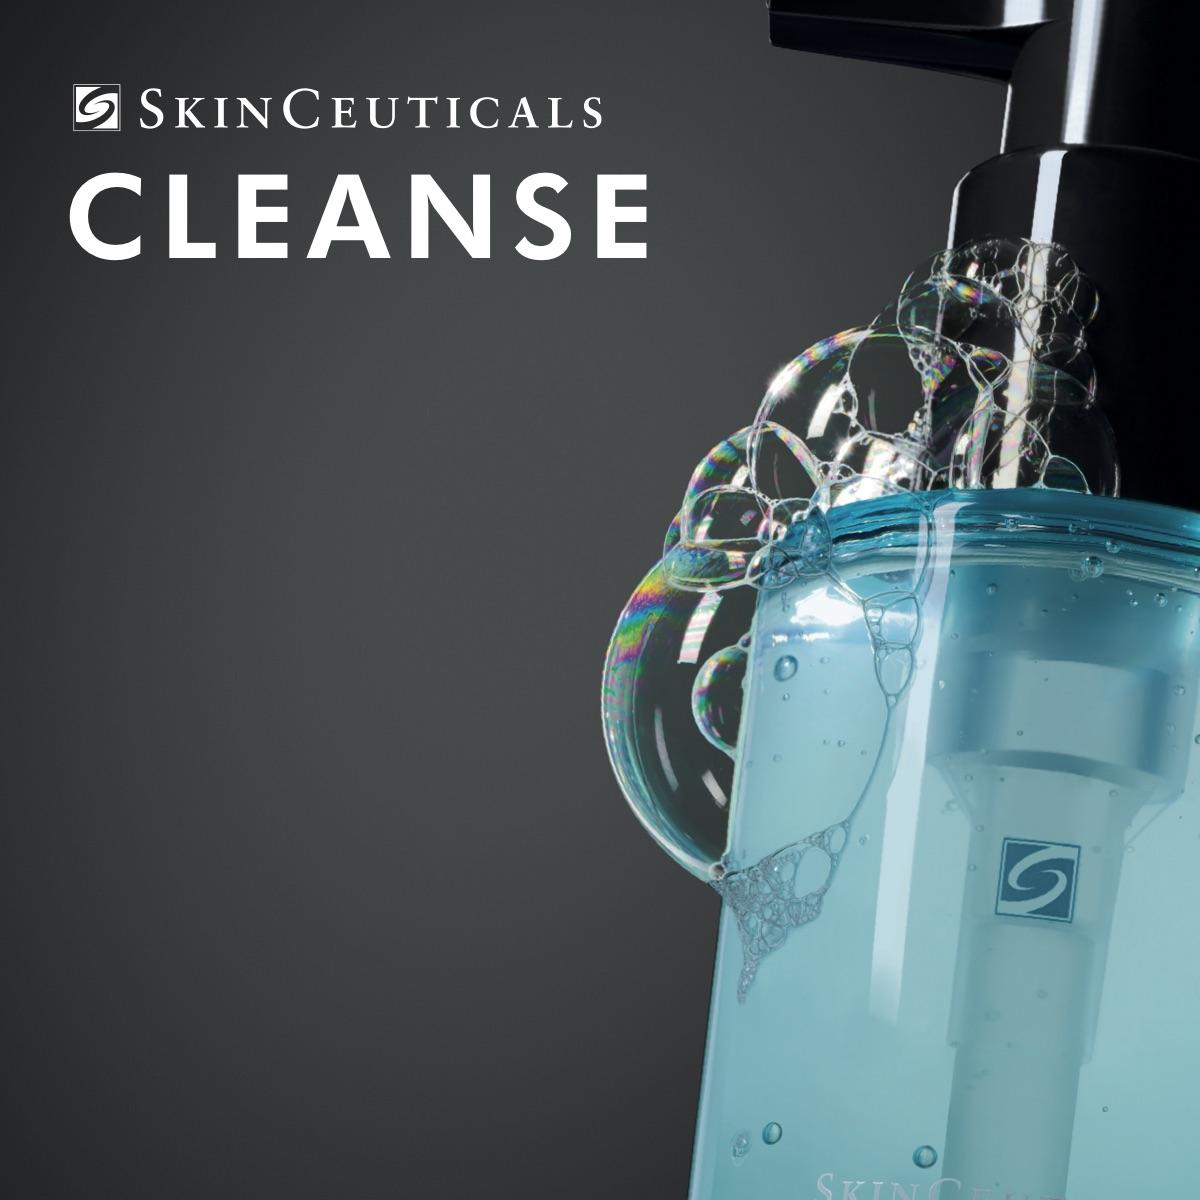 RP_Skinceuticals_1.jpg